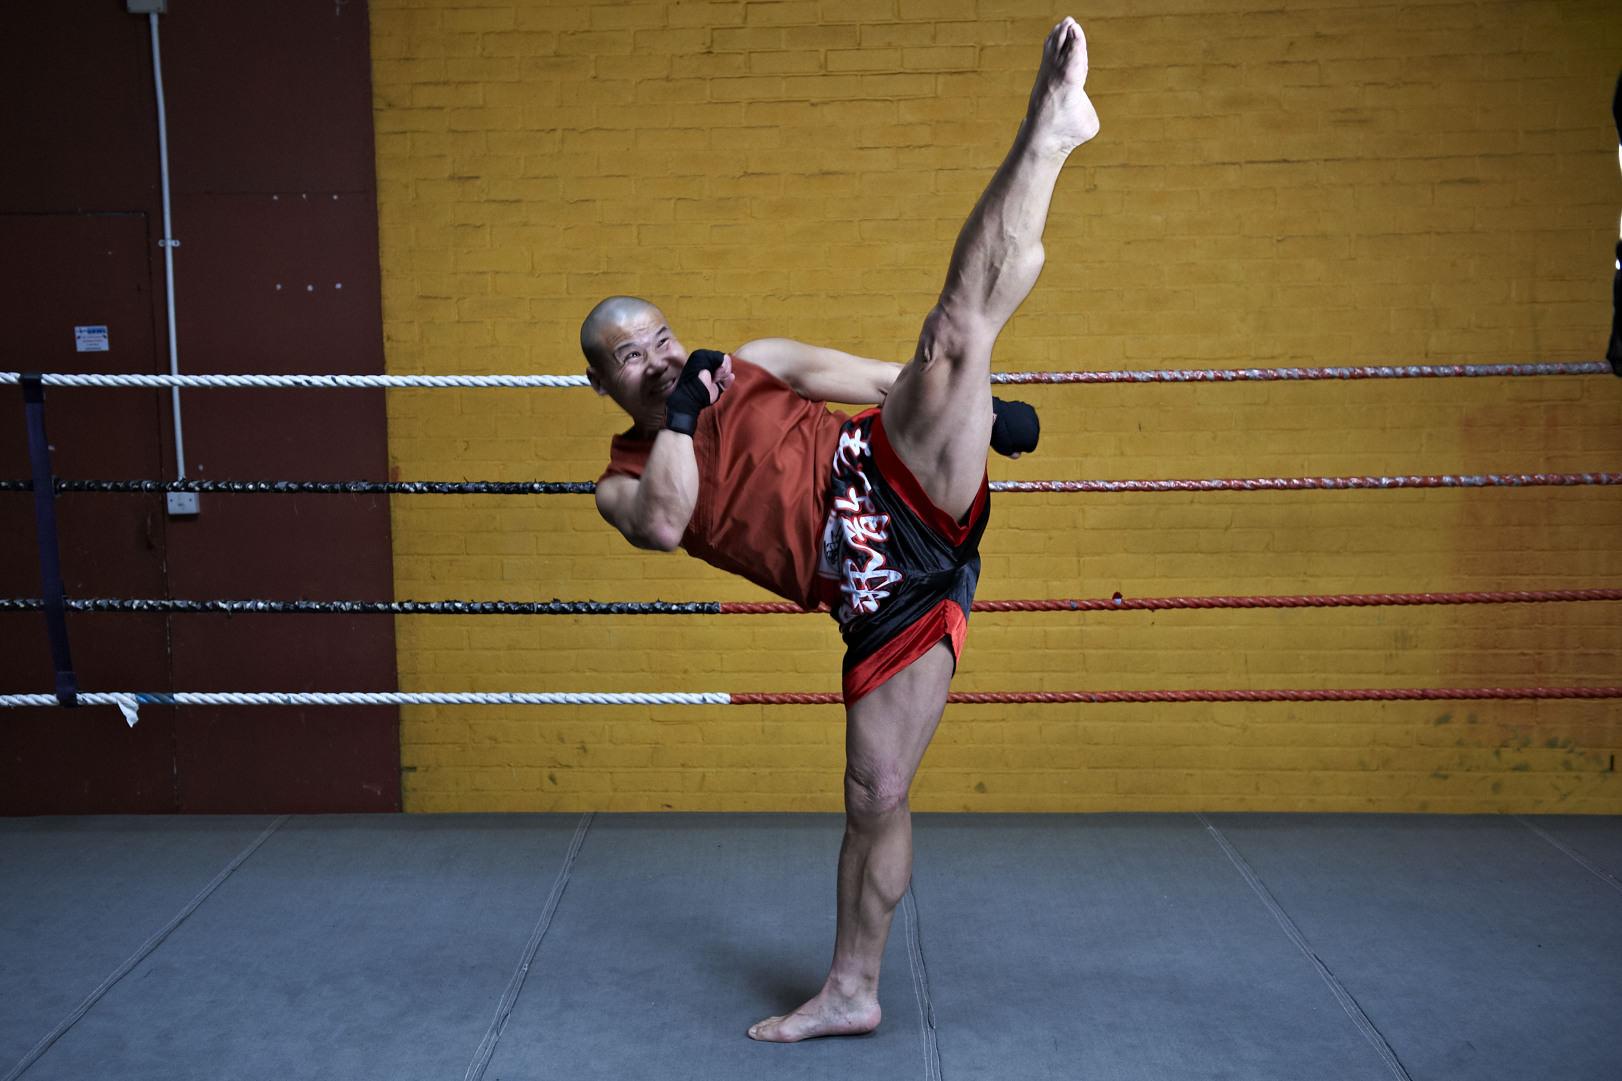 Shaolin temple uk shifu yanzi kick 23.jpg